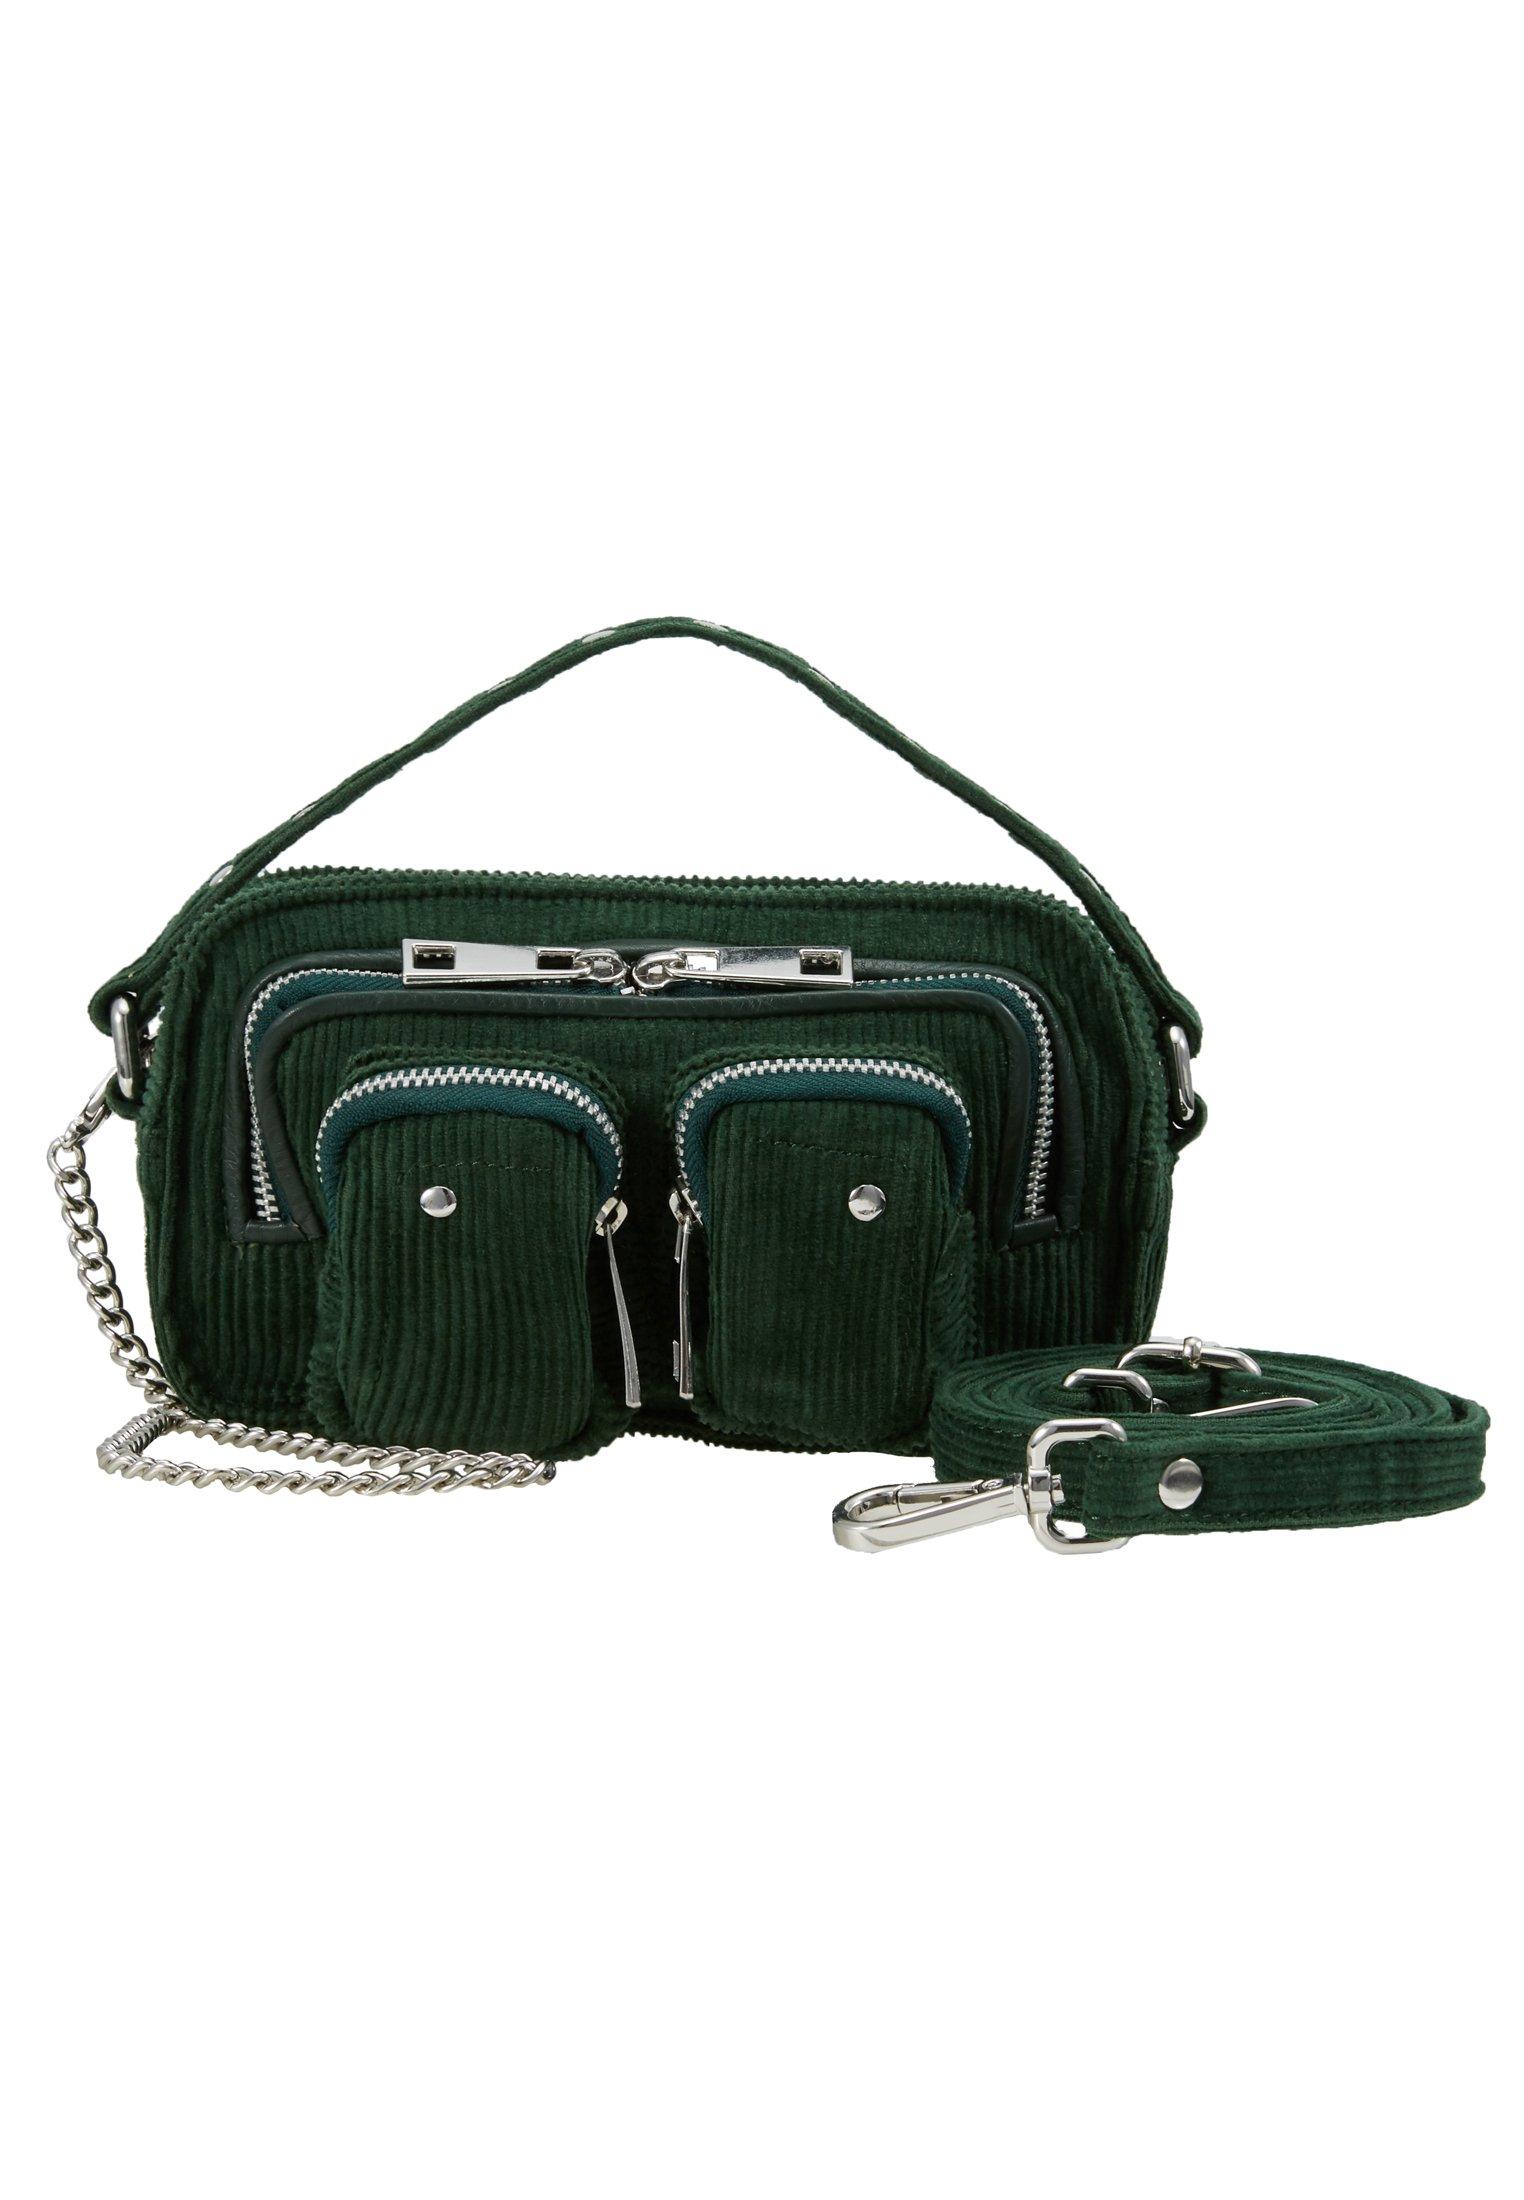 Núnoo HELENA CORDUROY - Håndveske - green/grønn YzTcJd3LBPYV3s8